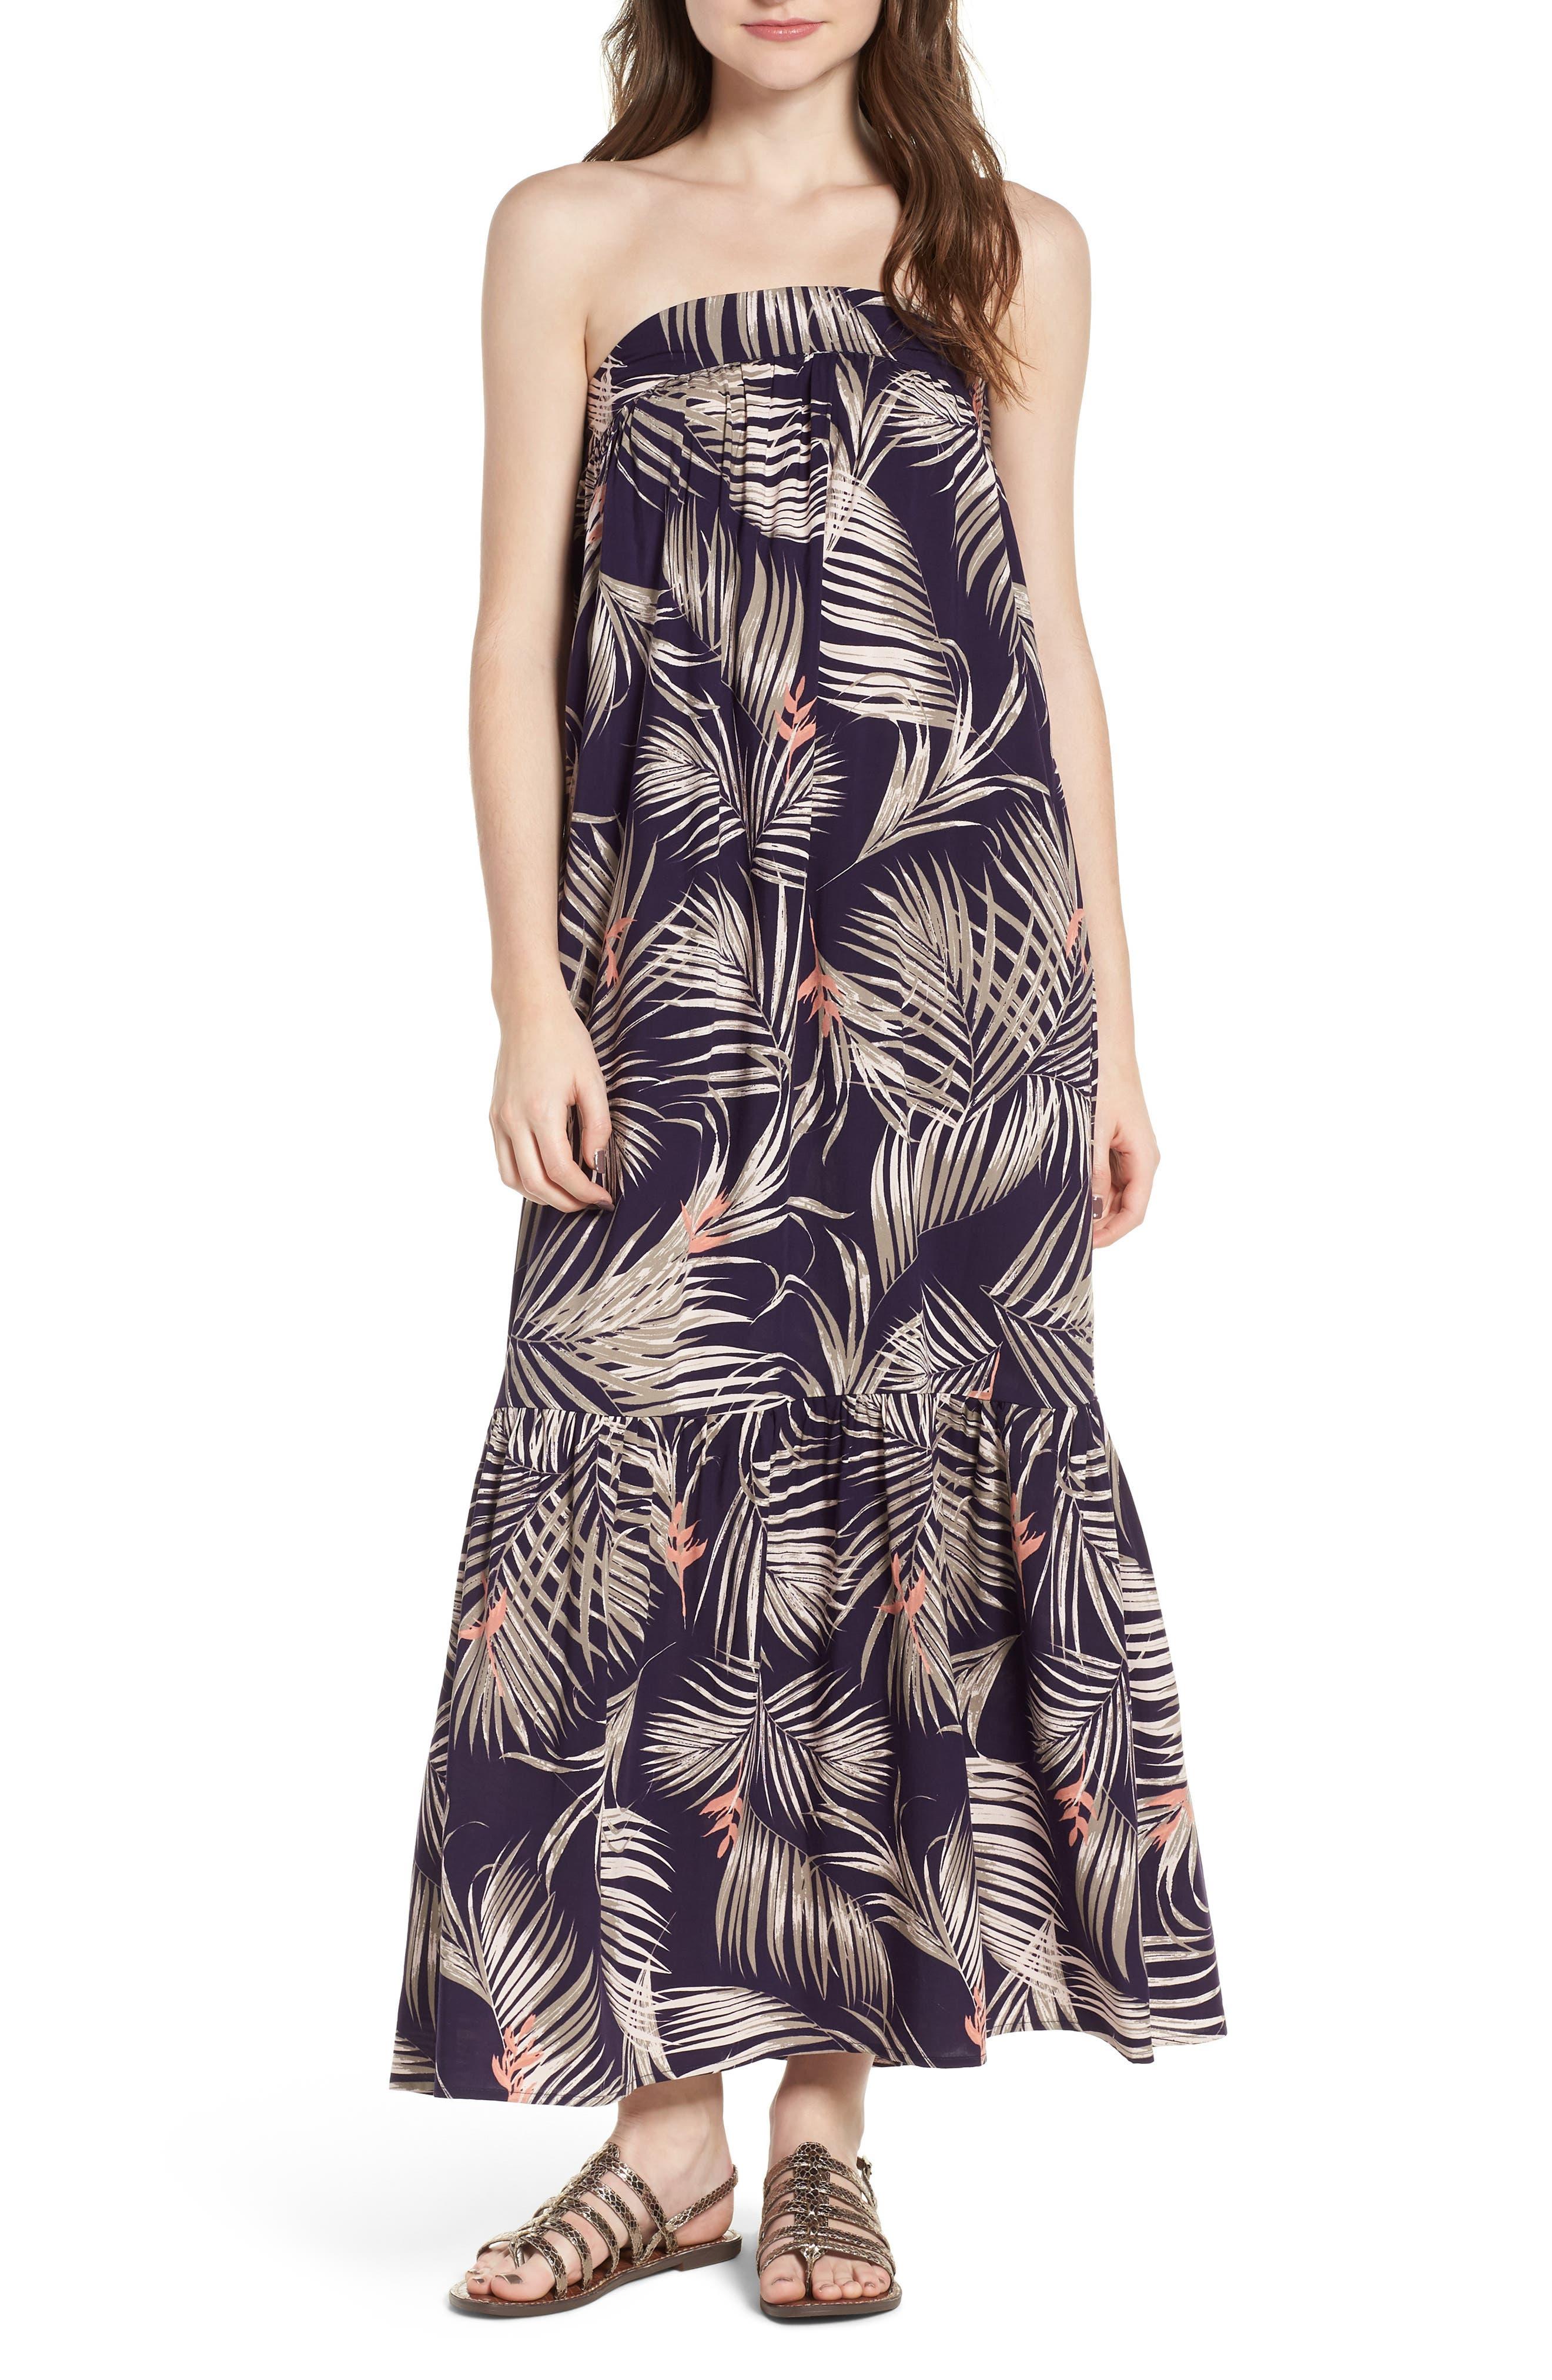 Sunset Cover-Up Maxi Dress,                             Main thumbnail 1, color,                             Latona Palm Evening Blue